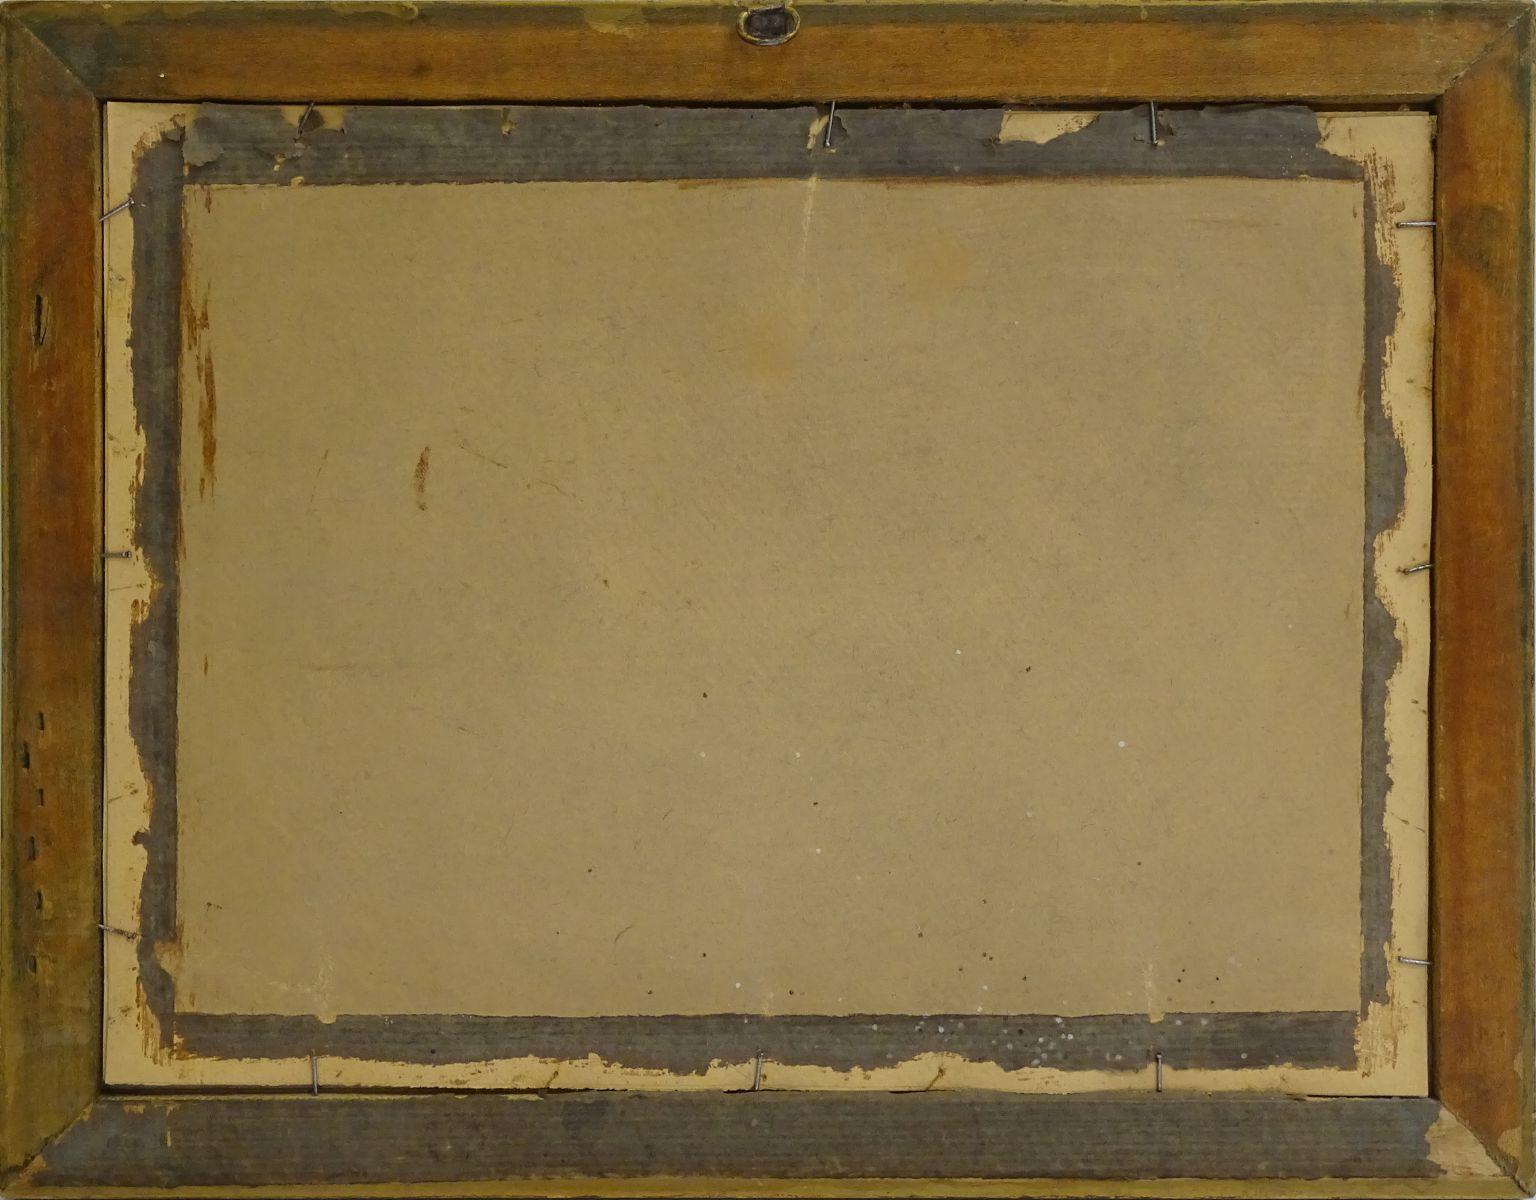 DSC09001.JPG (1536�1200)